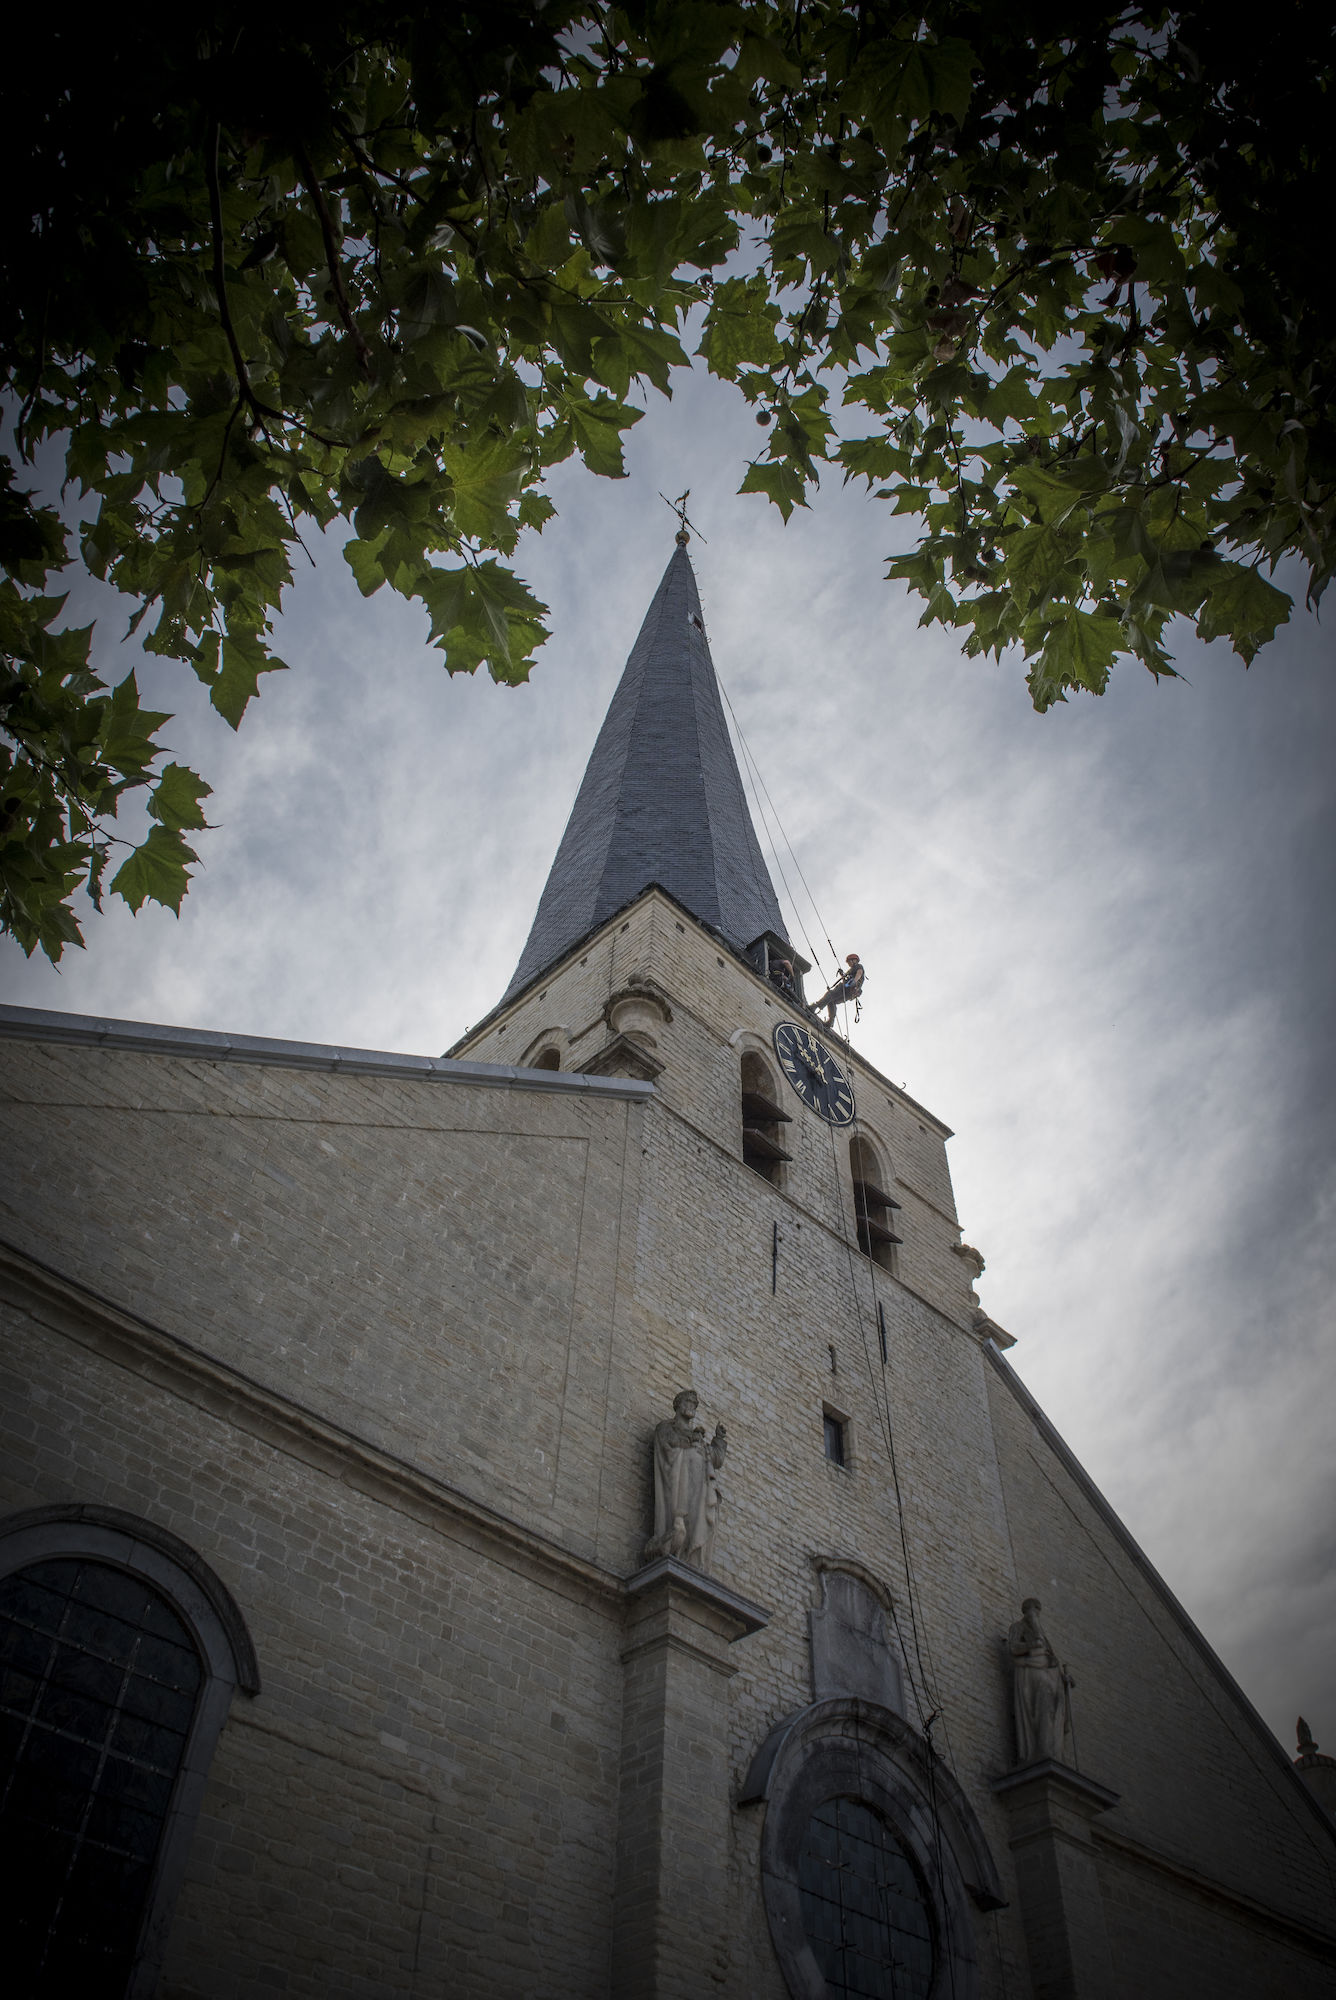 170823-Monumentenwacht-Kerk-Hamme-101.jpg